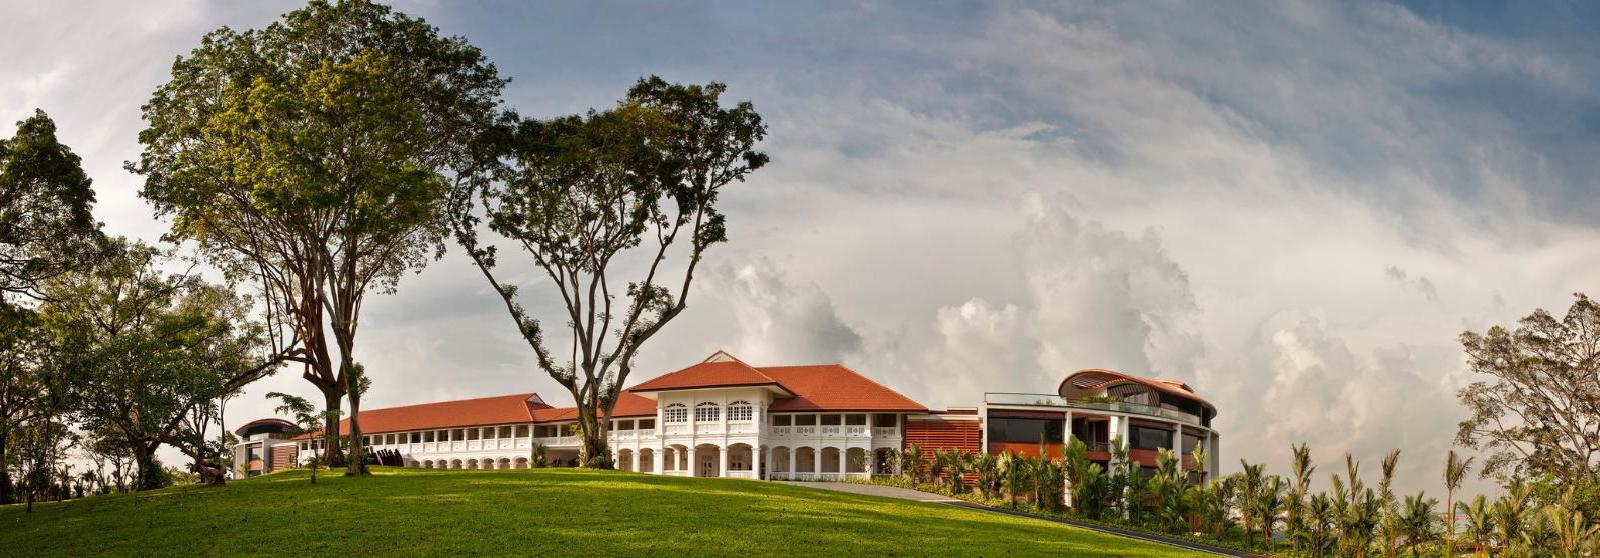 新加坡嘉佩乐酒店(Capella Singapore) 图片  www.lhw.cn